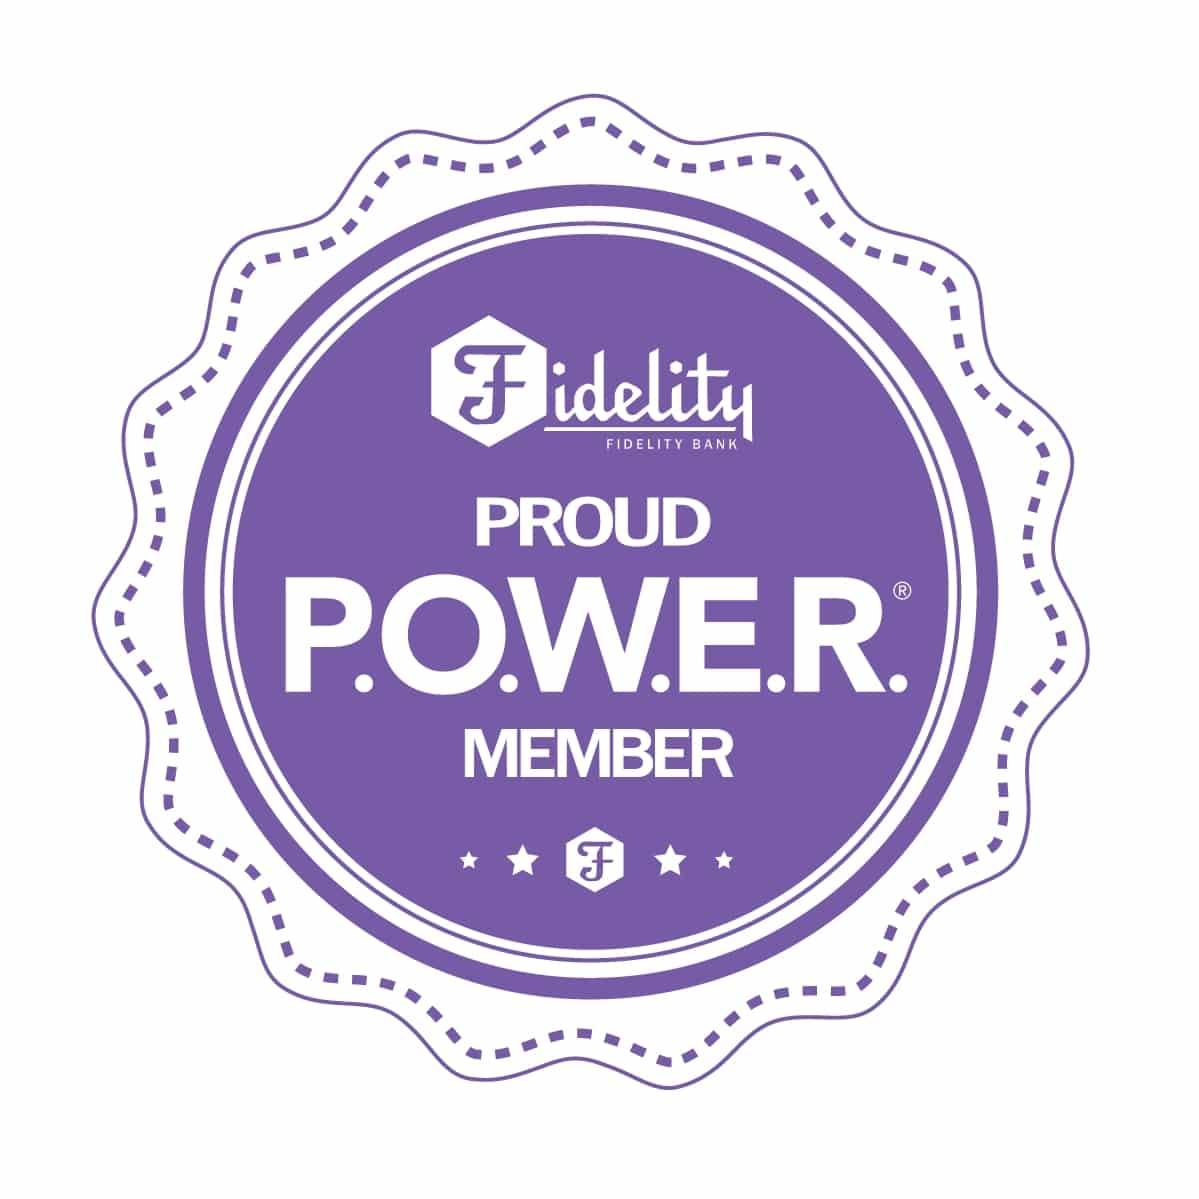 POWER Proud Member